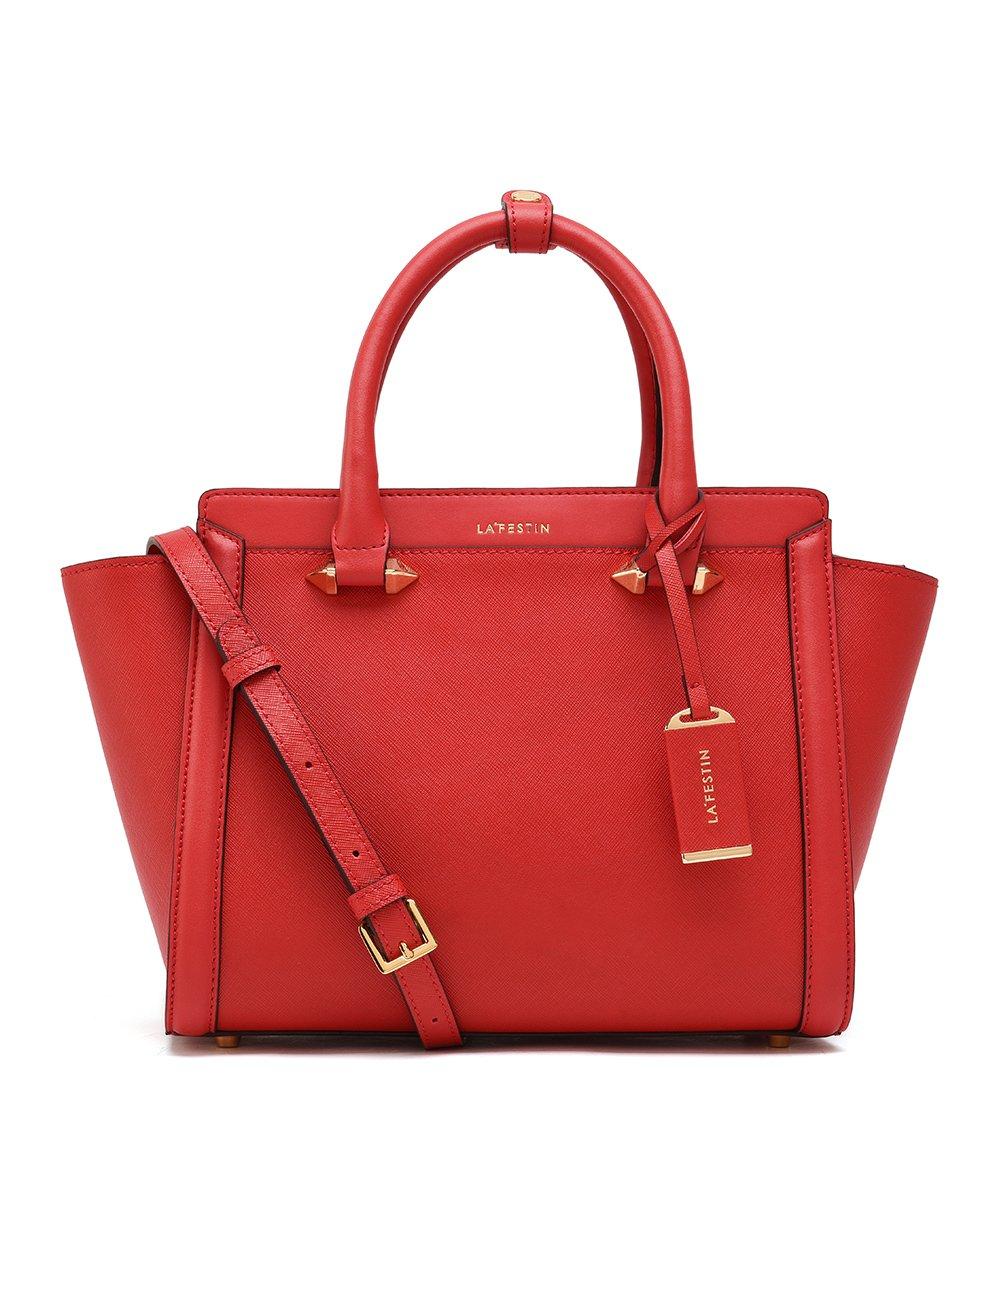 LA'FESTIN Bags for Women 2017 Fashion Big Purses Genuine Leather Top Handle Handbags (Red)